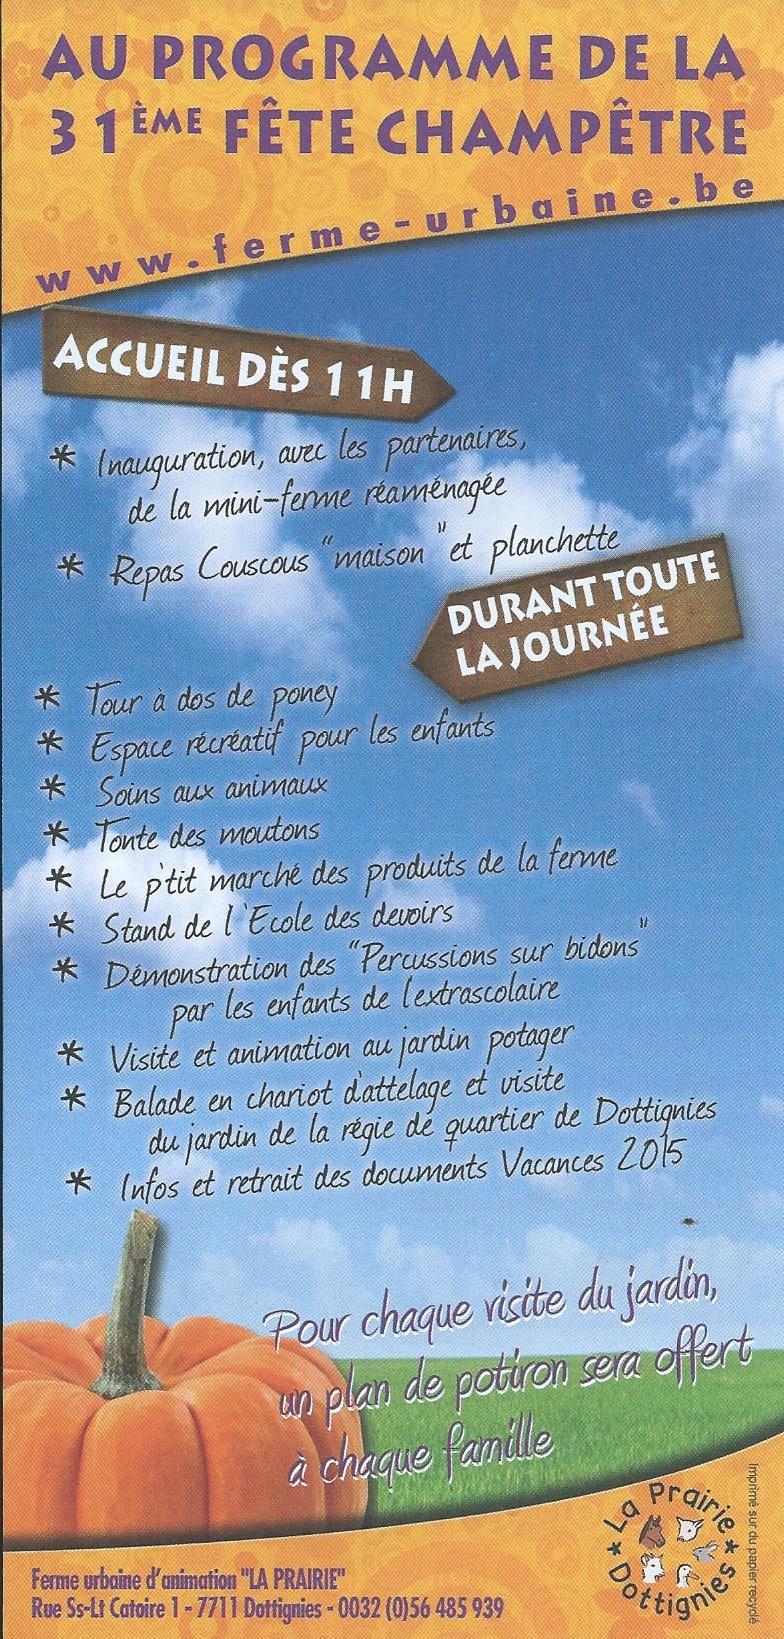 Fête Champêtre de la Prairie 2015 - Programme